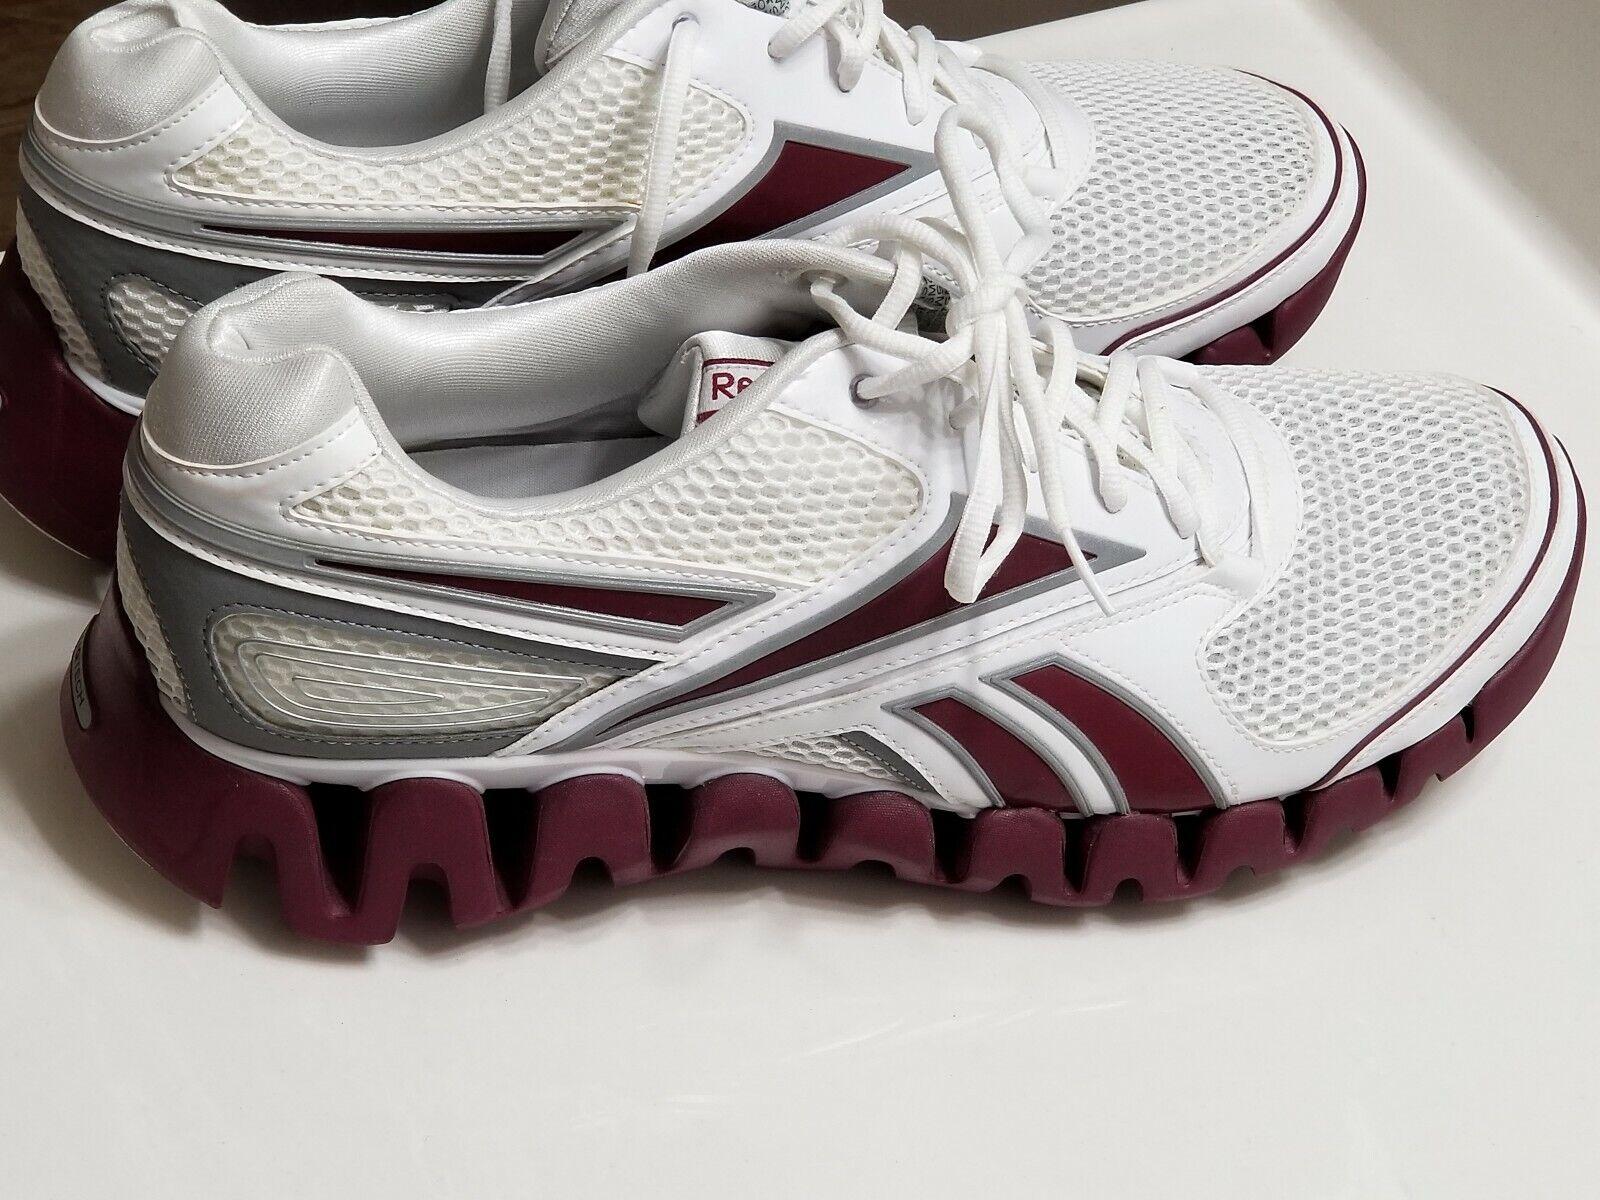 Reebok Zigtech Trainer Purple and White Mens Size 15 Medium New